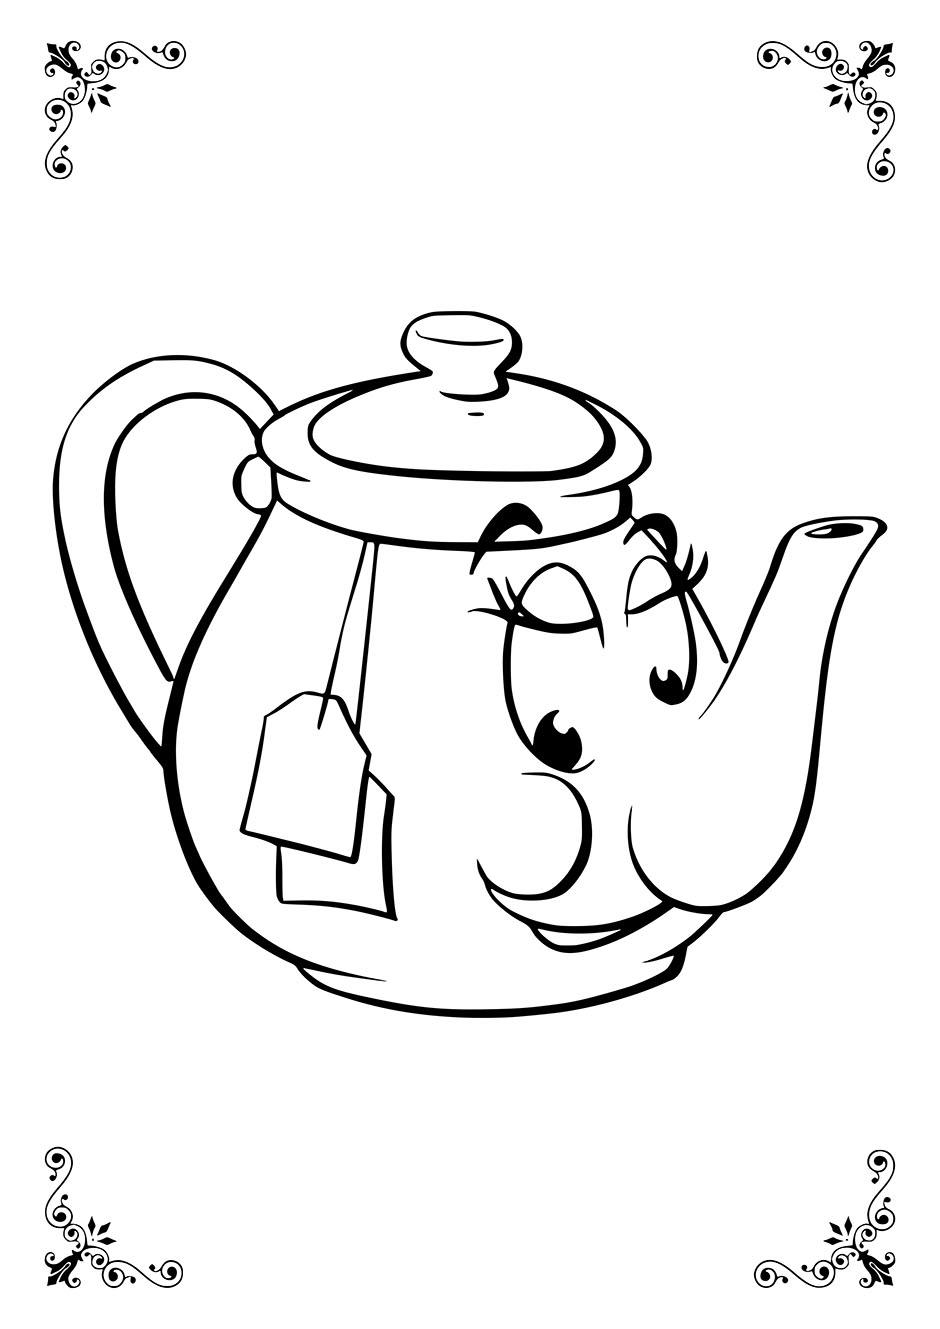 Раскраска: чайник с глазками — raskraski-a4.ru